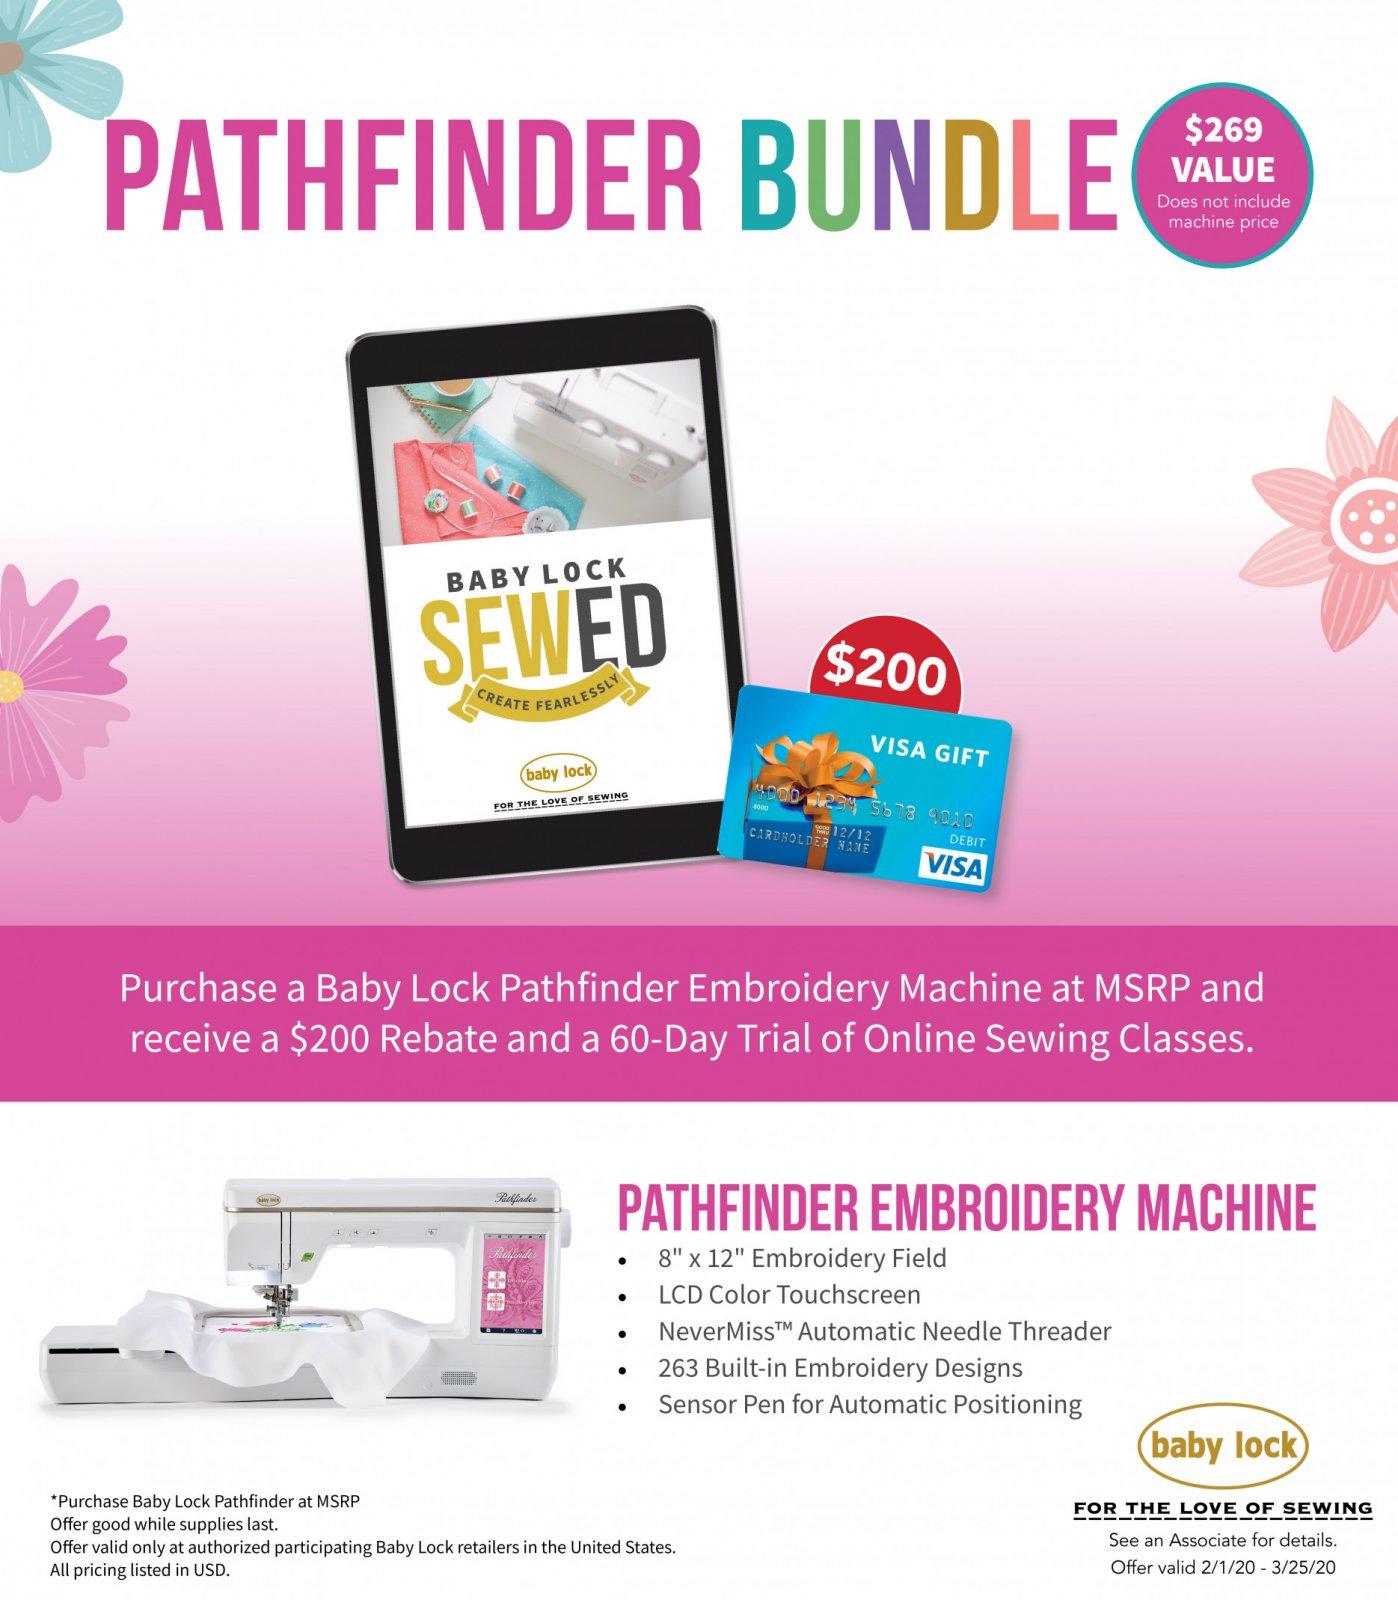 Pathfinder Bundle